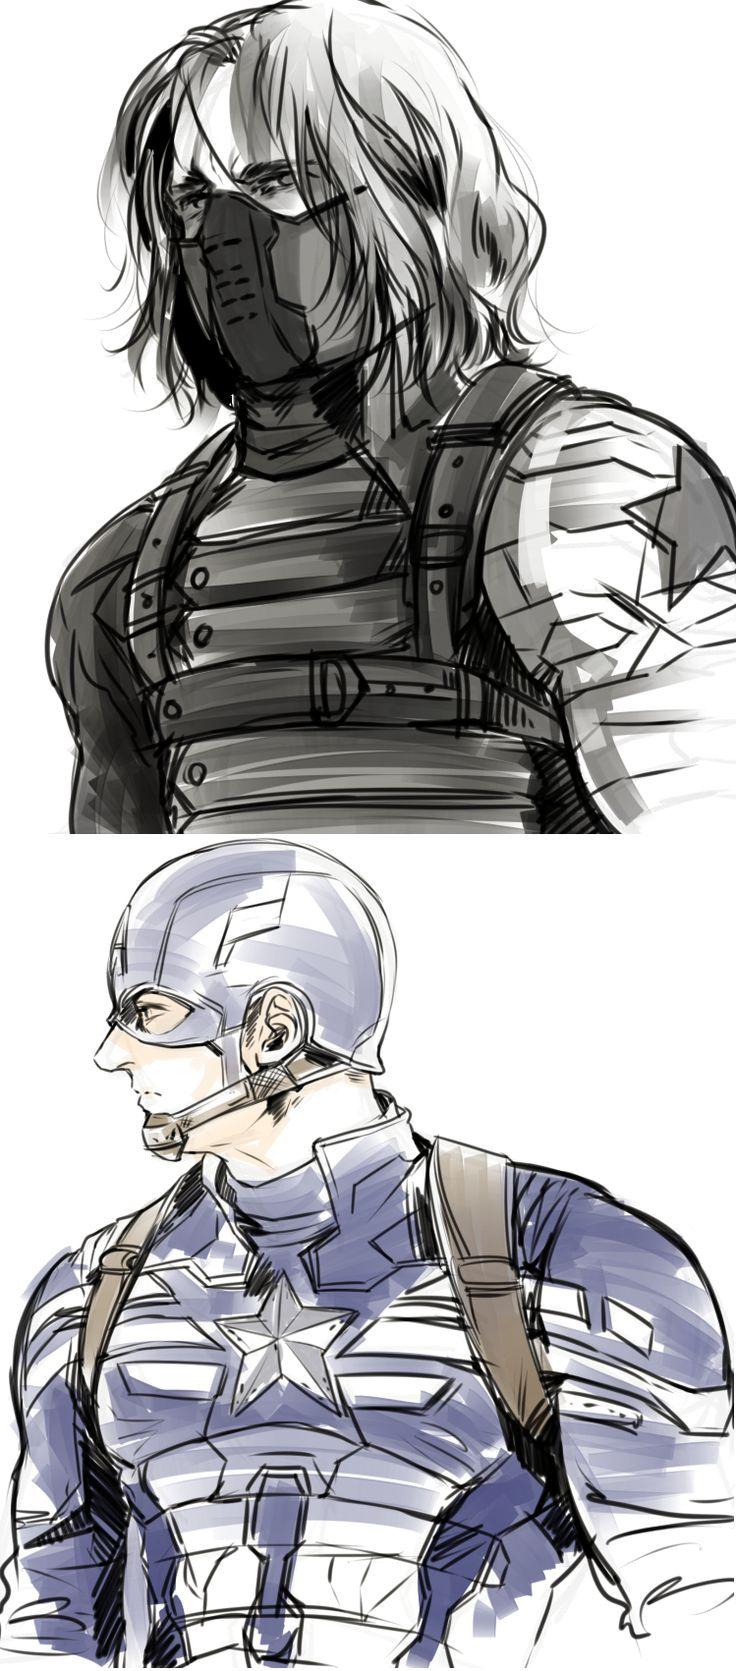 The Winter Soldier and Captain America. http://rednavi.tumblr.com/